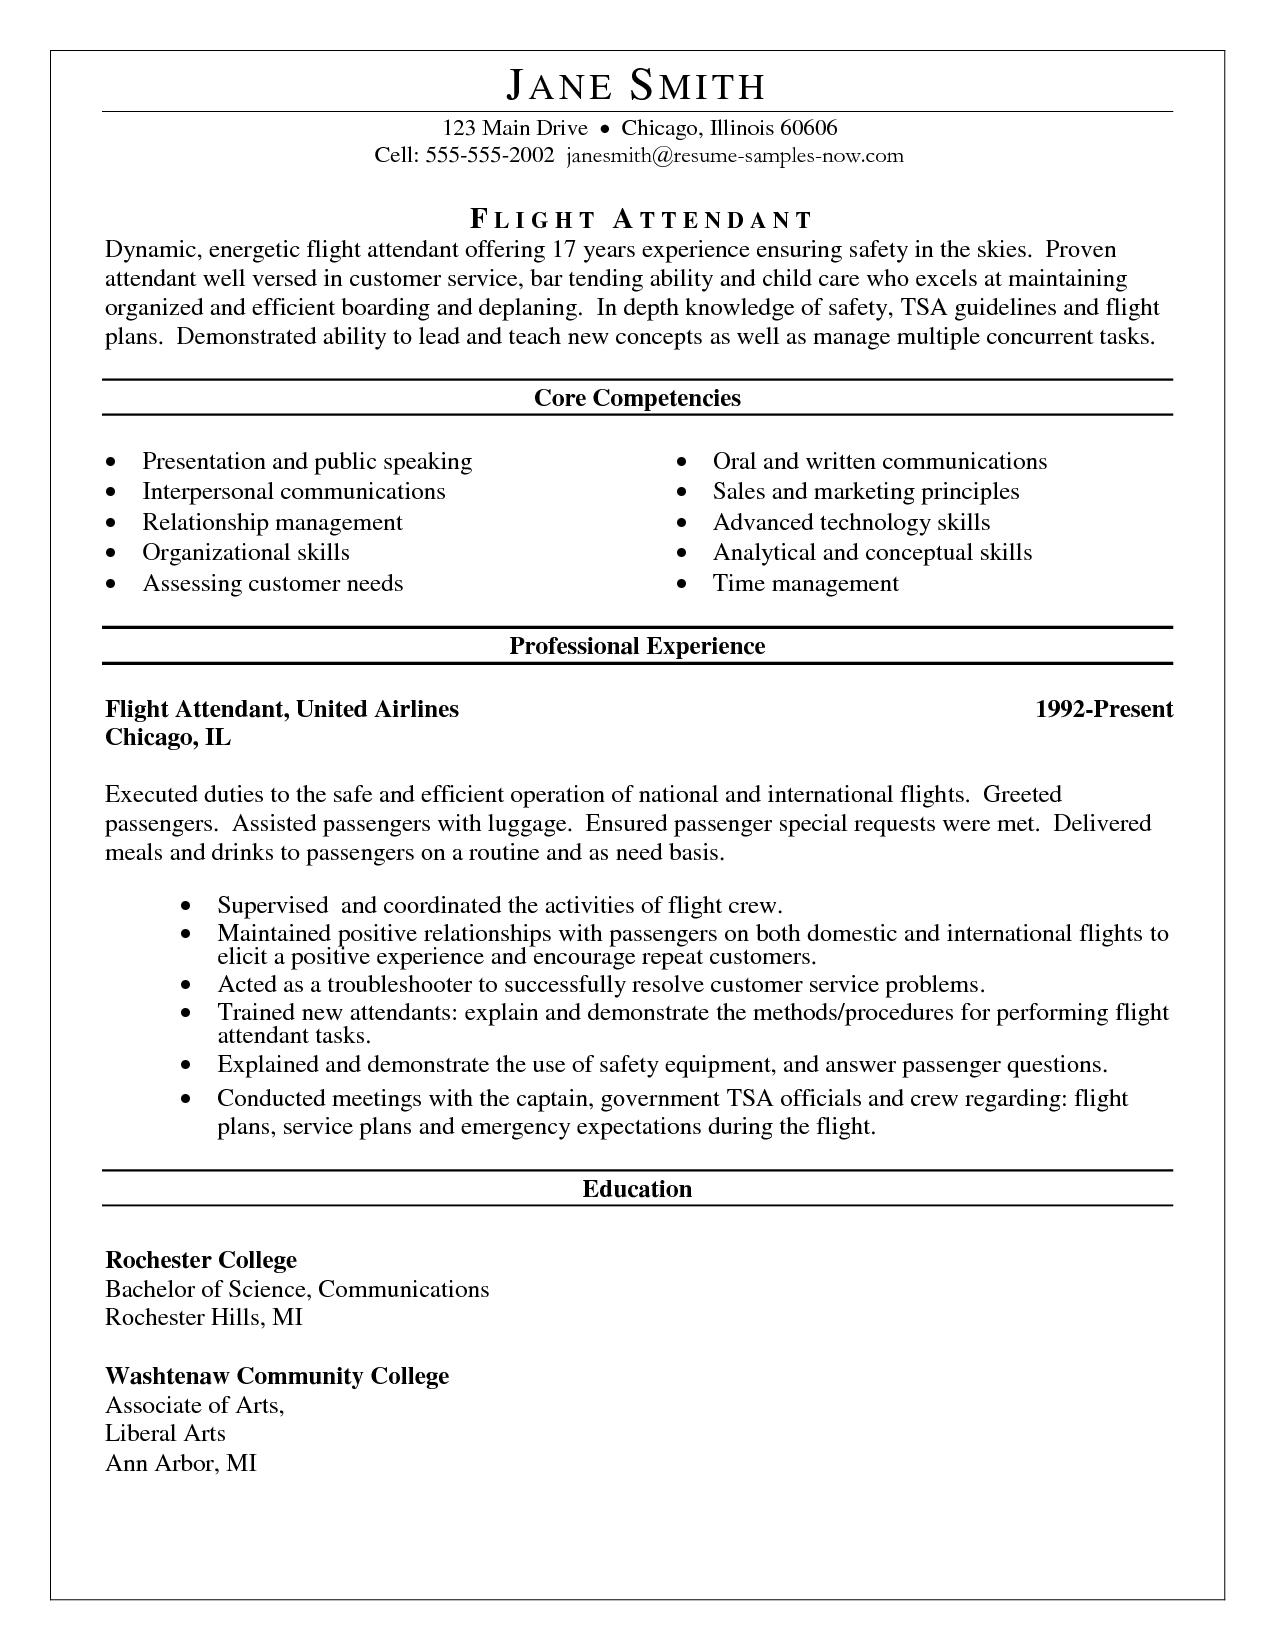 Key Competencies Flight attendant resume, Resume